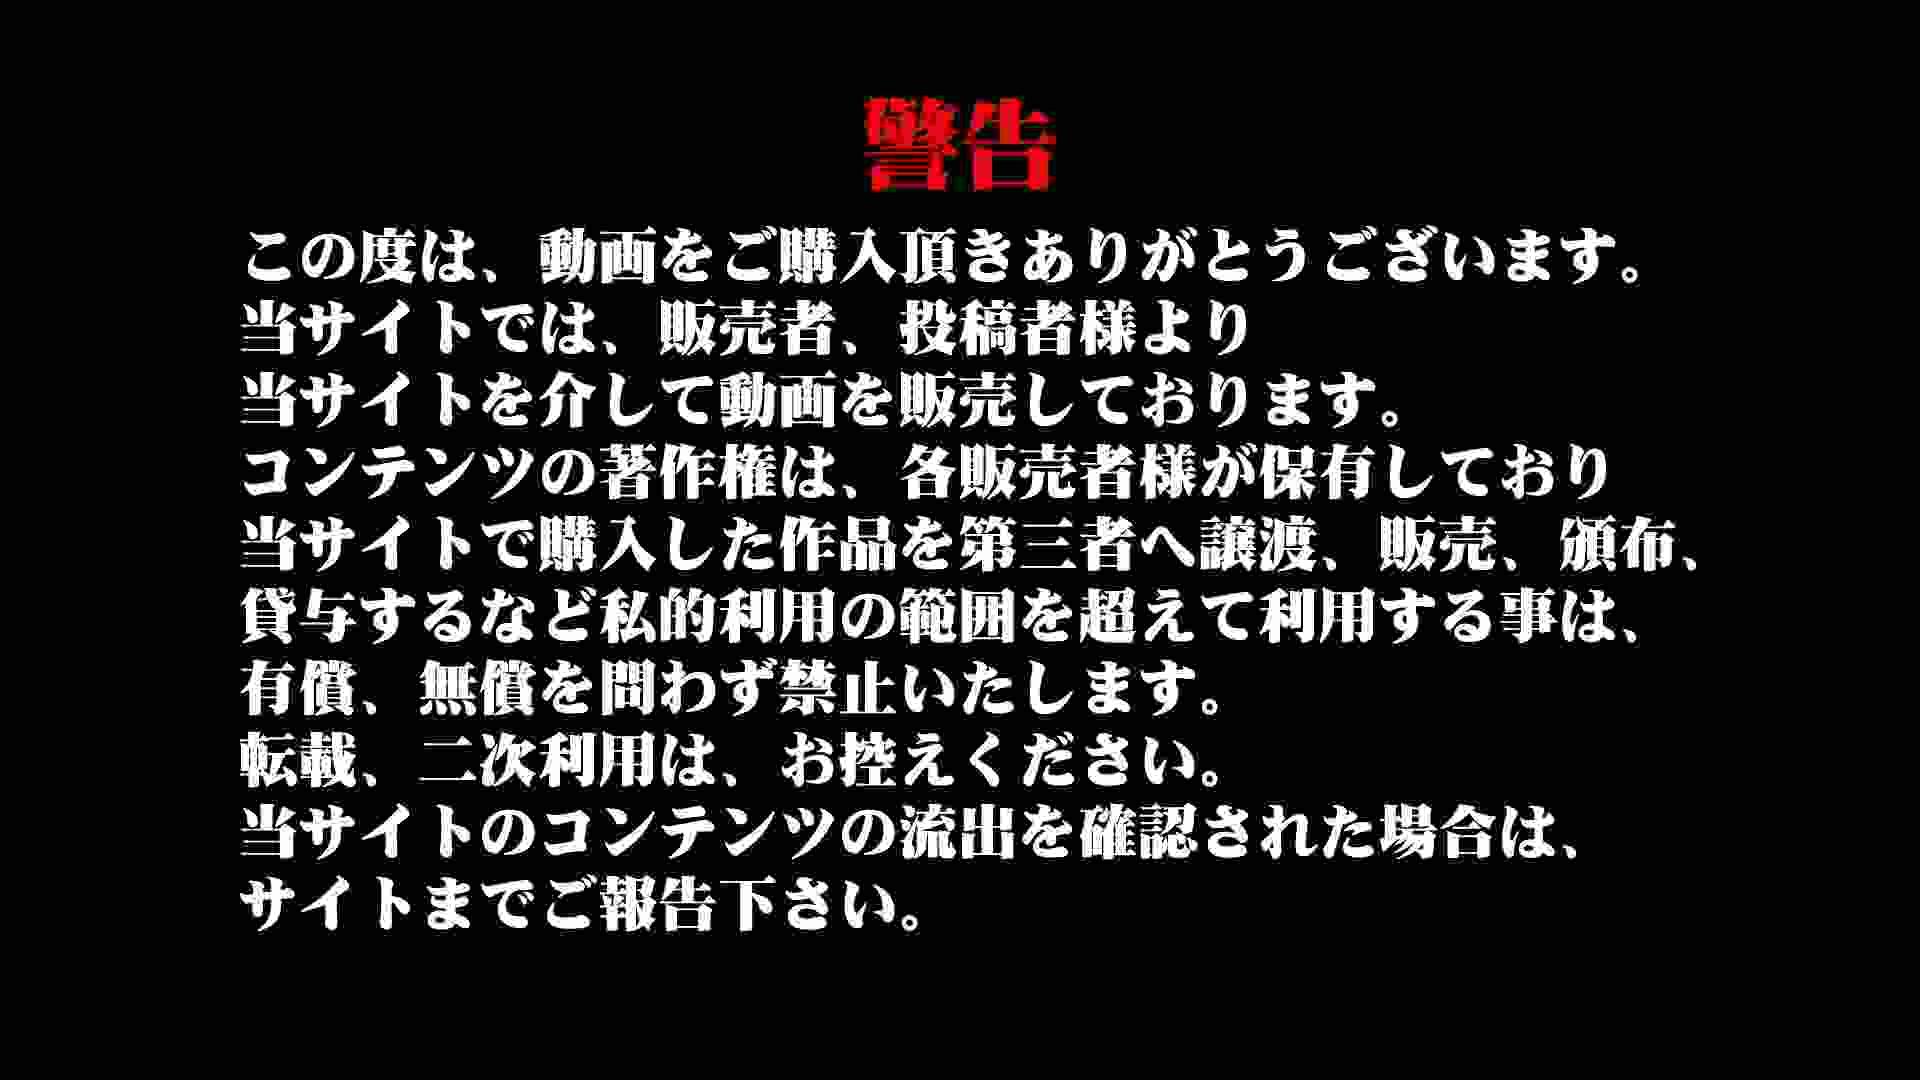 芸術大学ガチ潜入盗撮 JD盗撮 美女の洗面所の秘密 Vol.80 盛合せ  79PIX 2